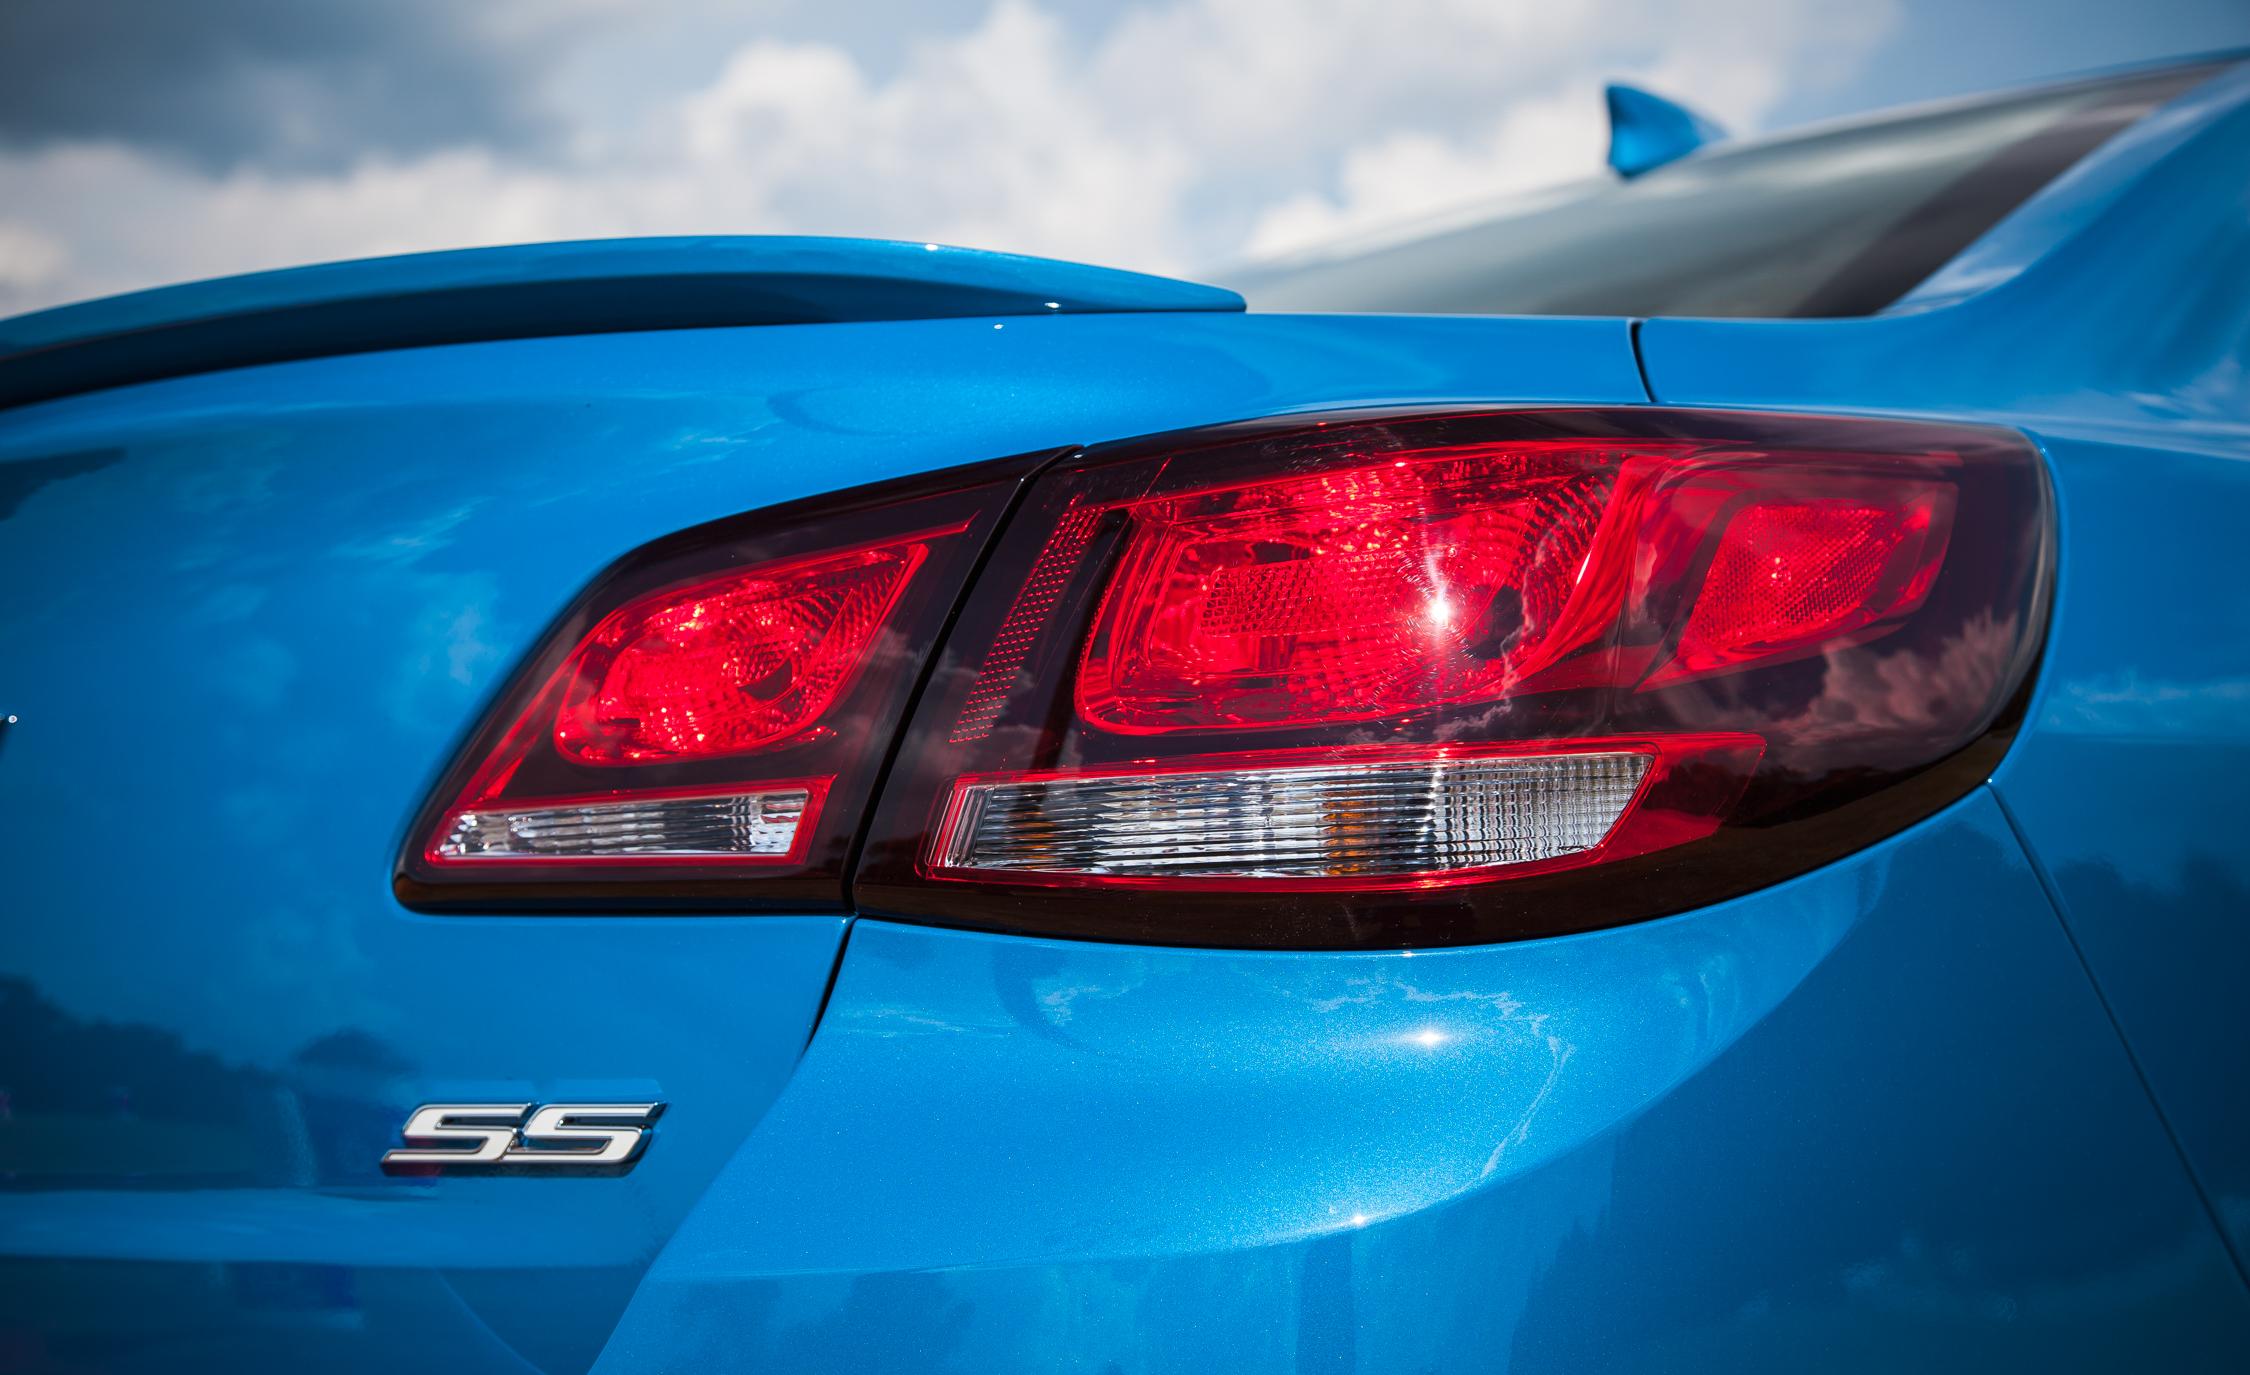 2015 Chevrolet SS Exterior Taillight